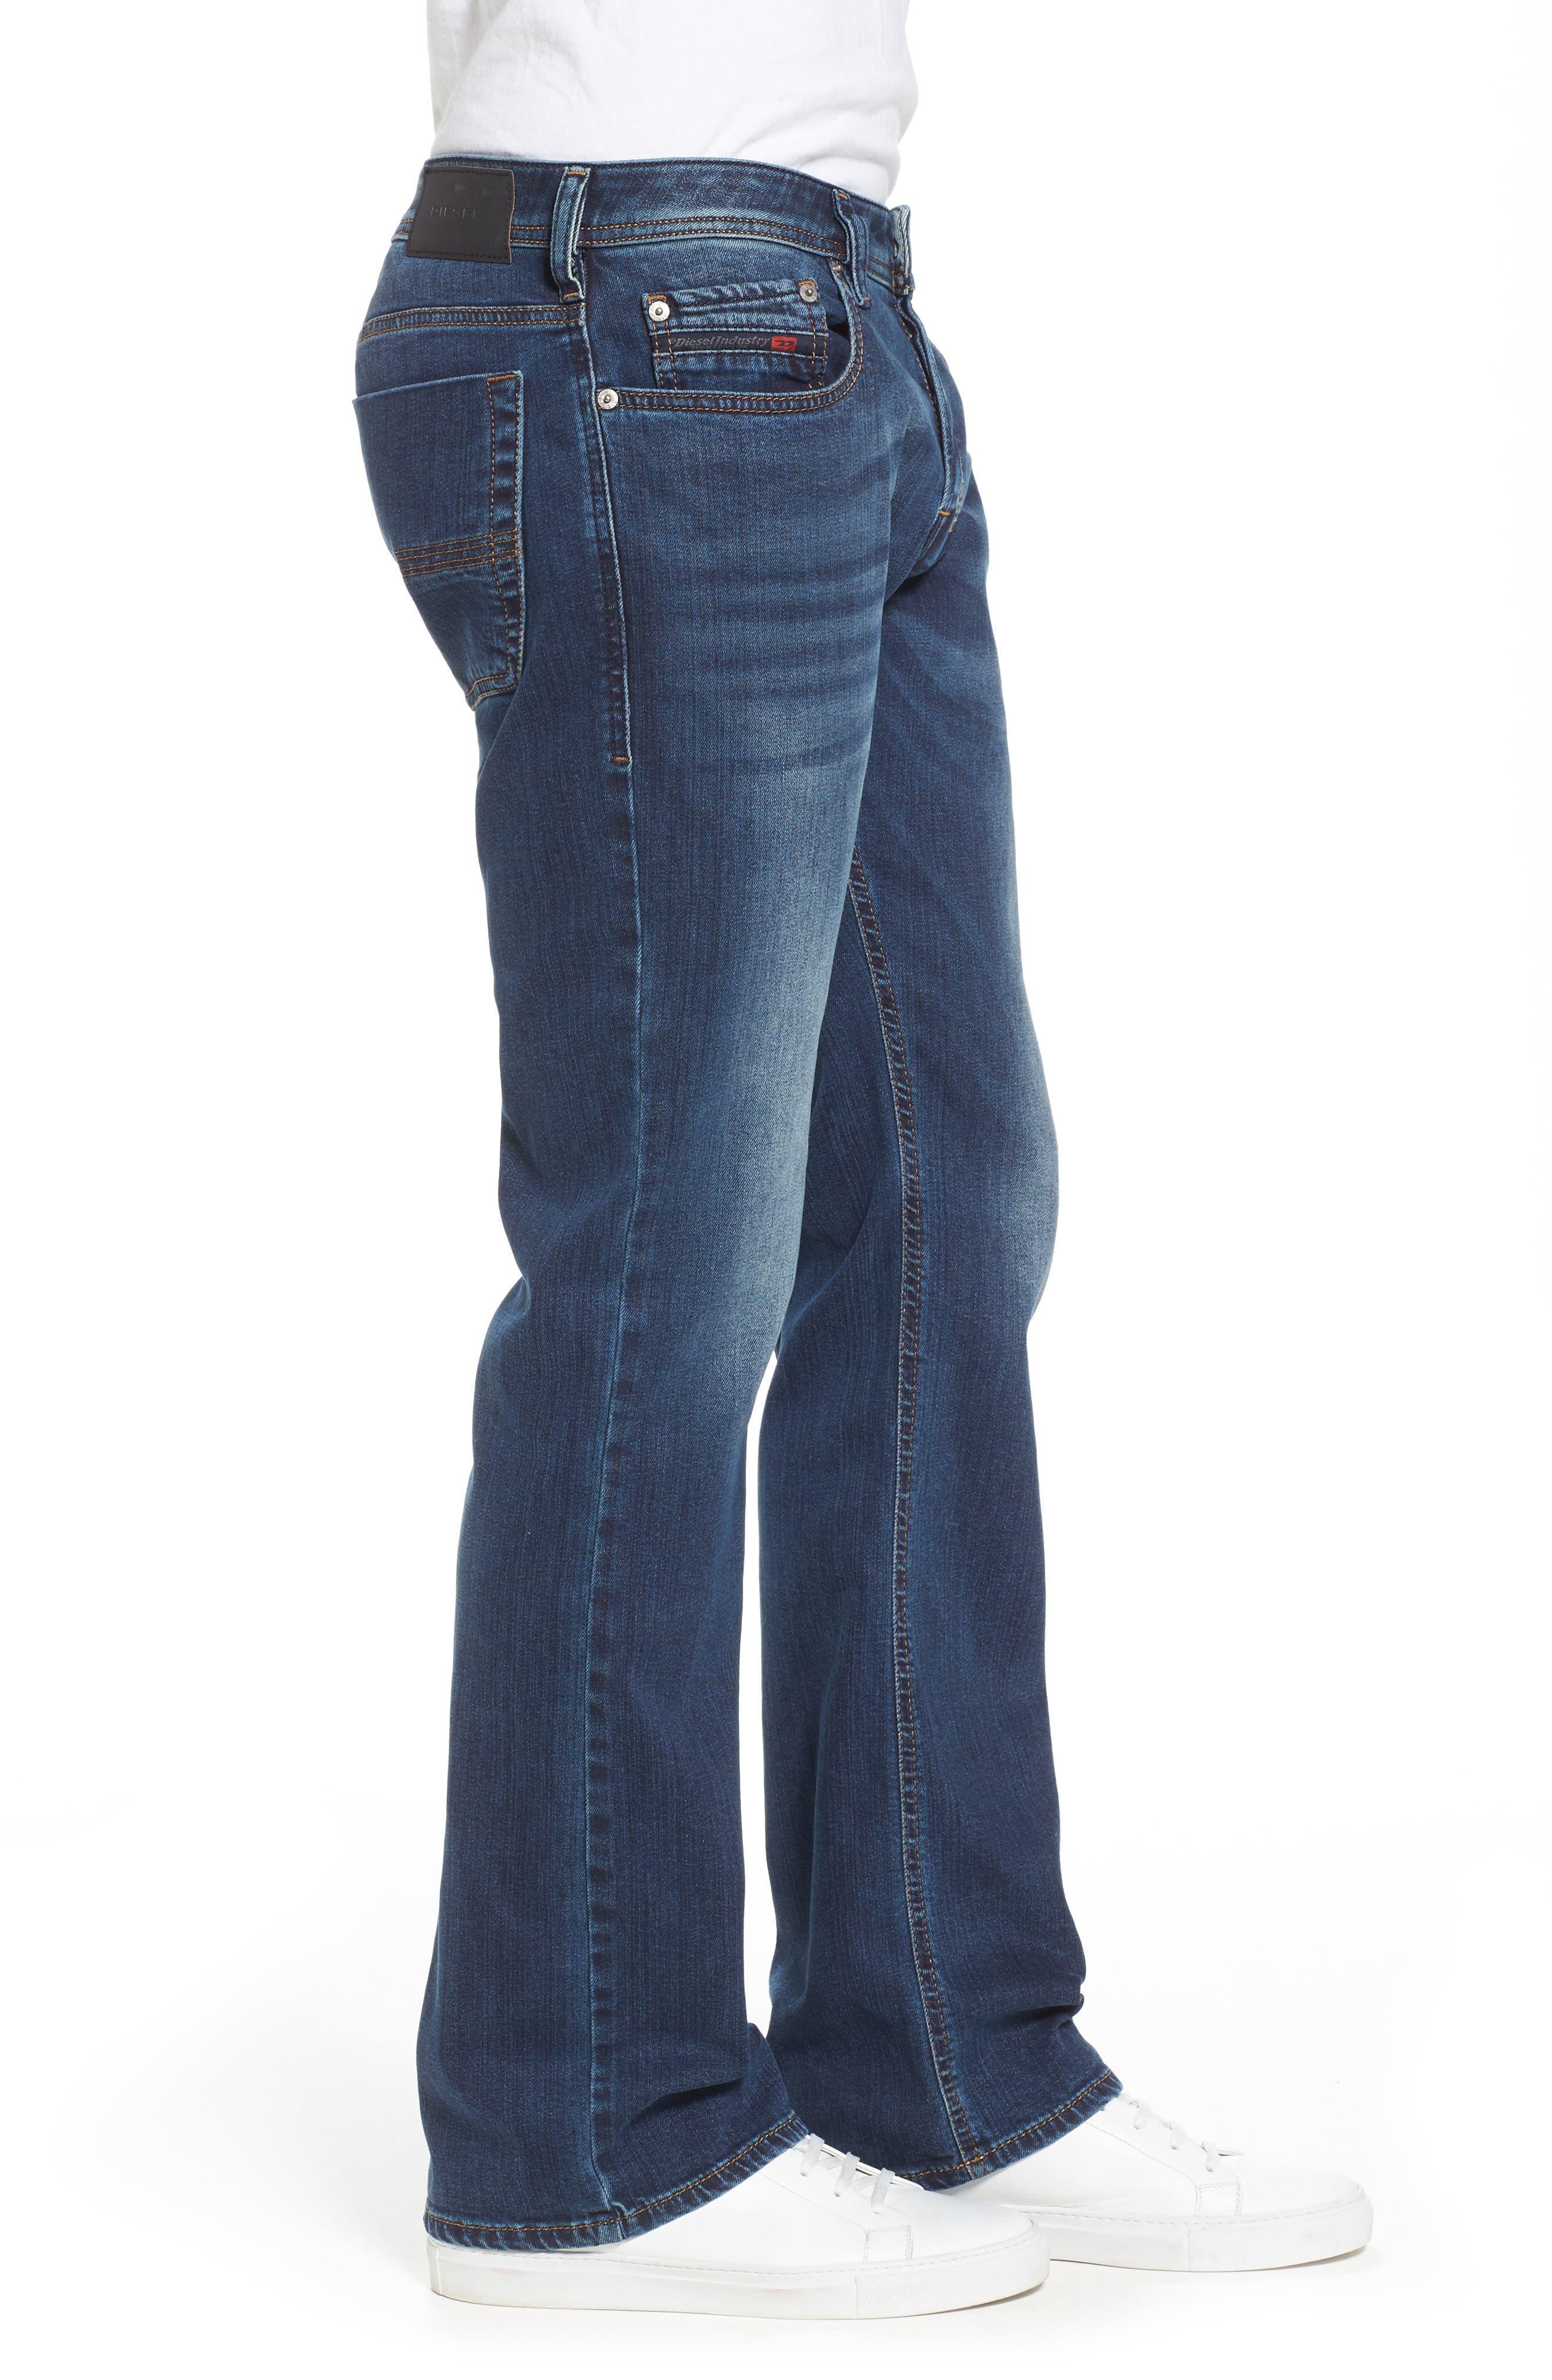 Zatiny Bootcut Jeans,                             Alternate thumbnail 3, color,                             084BU